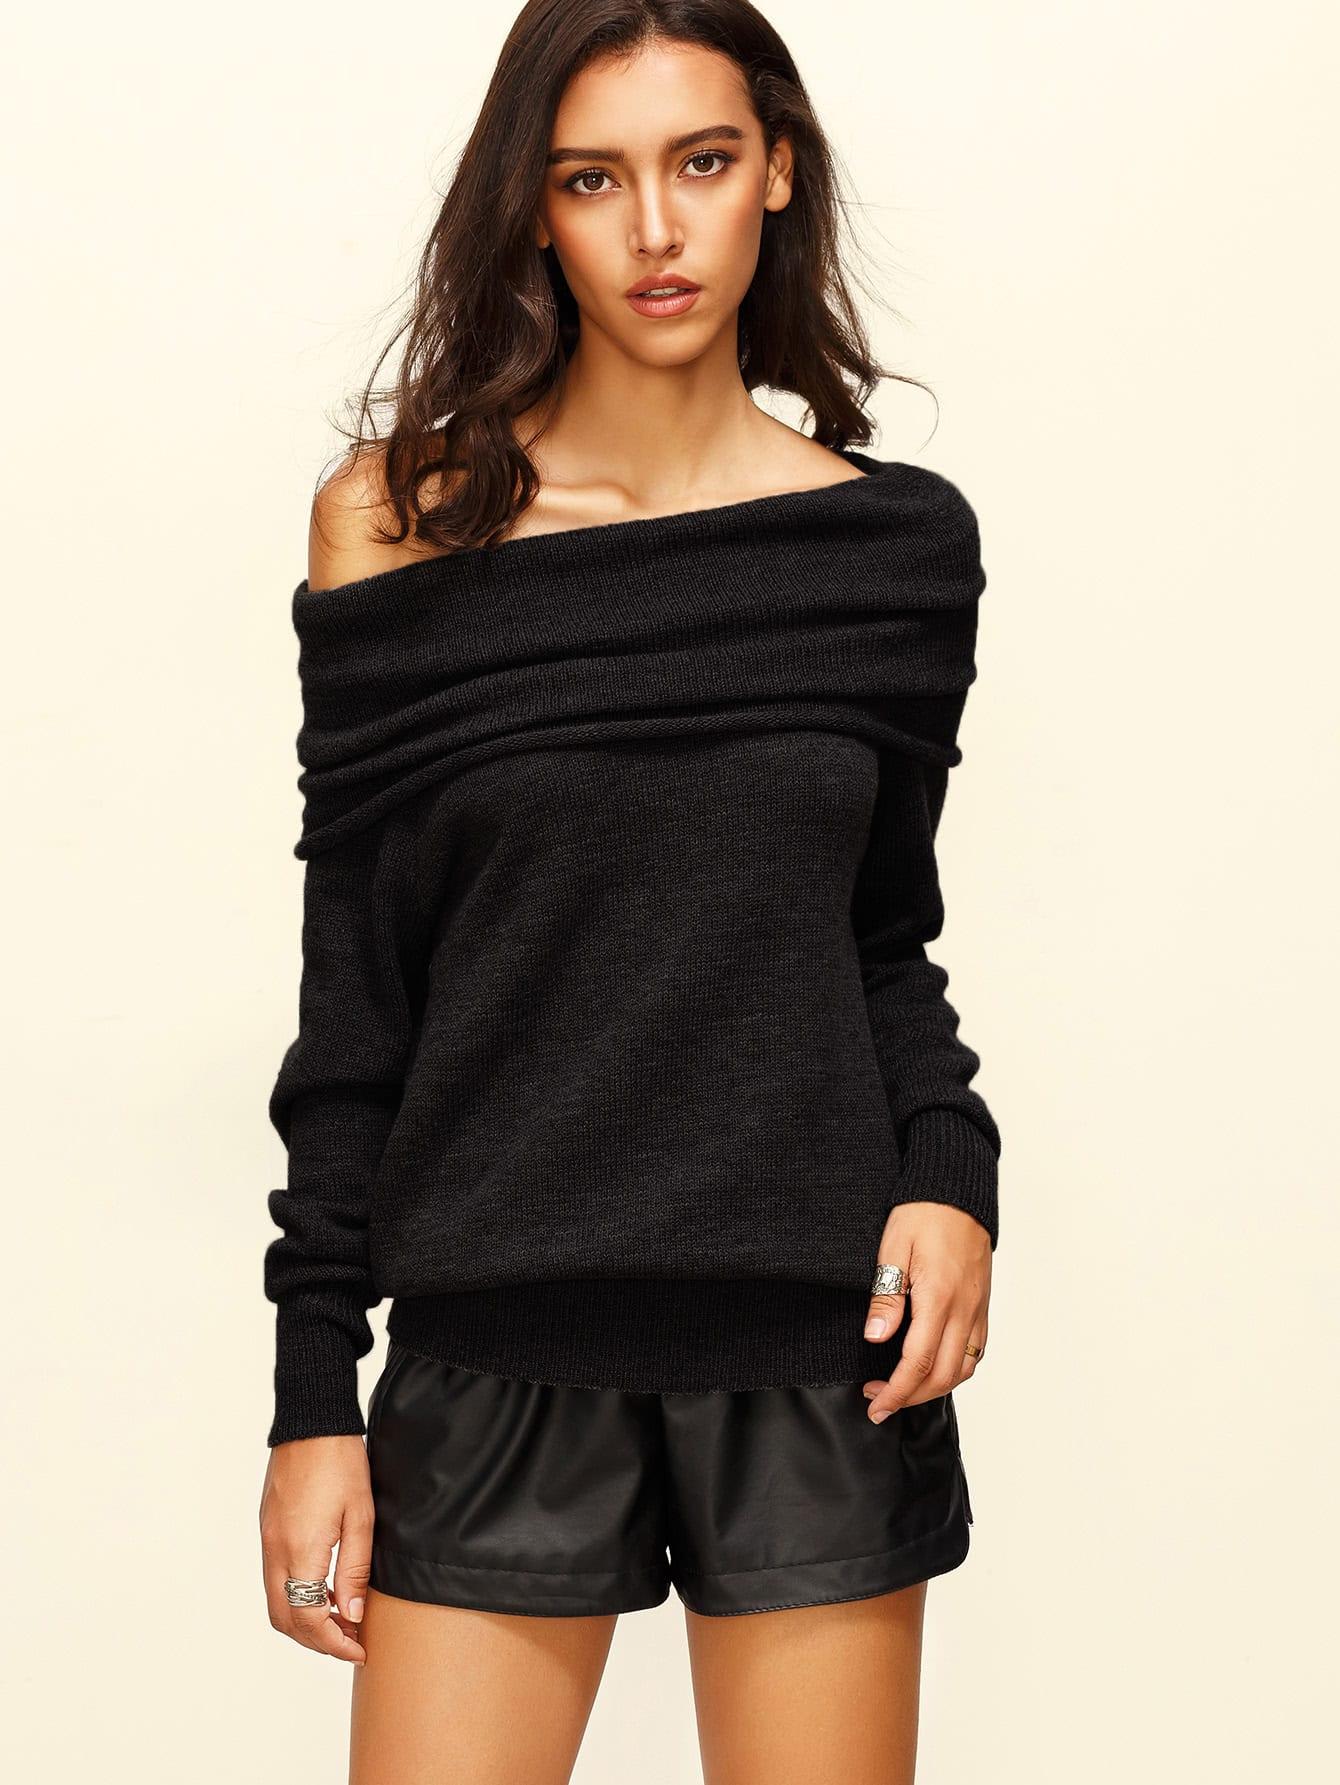 Raglan Sleeve Two Way Sweater купить ваз 21213 в украине